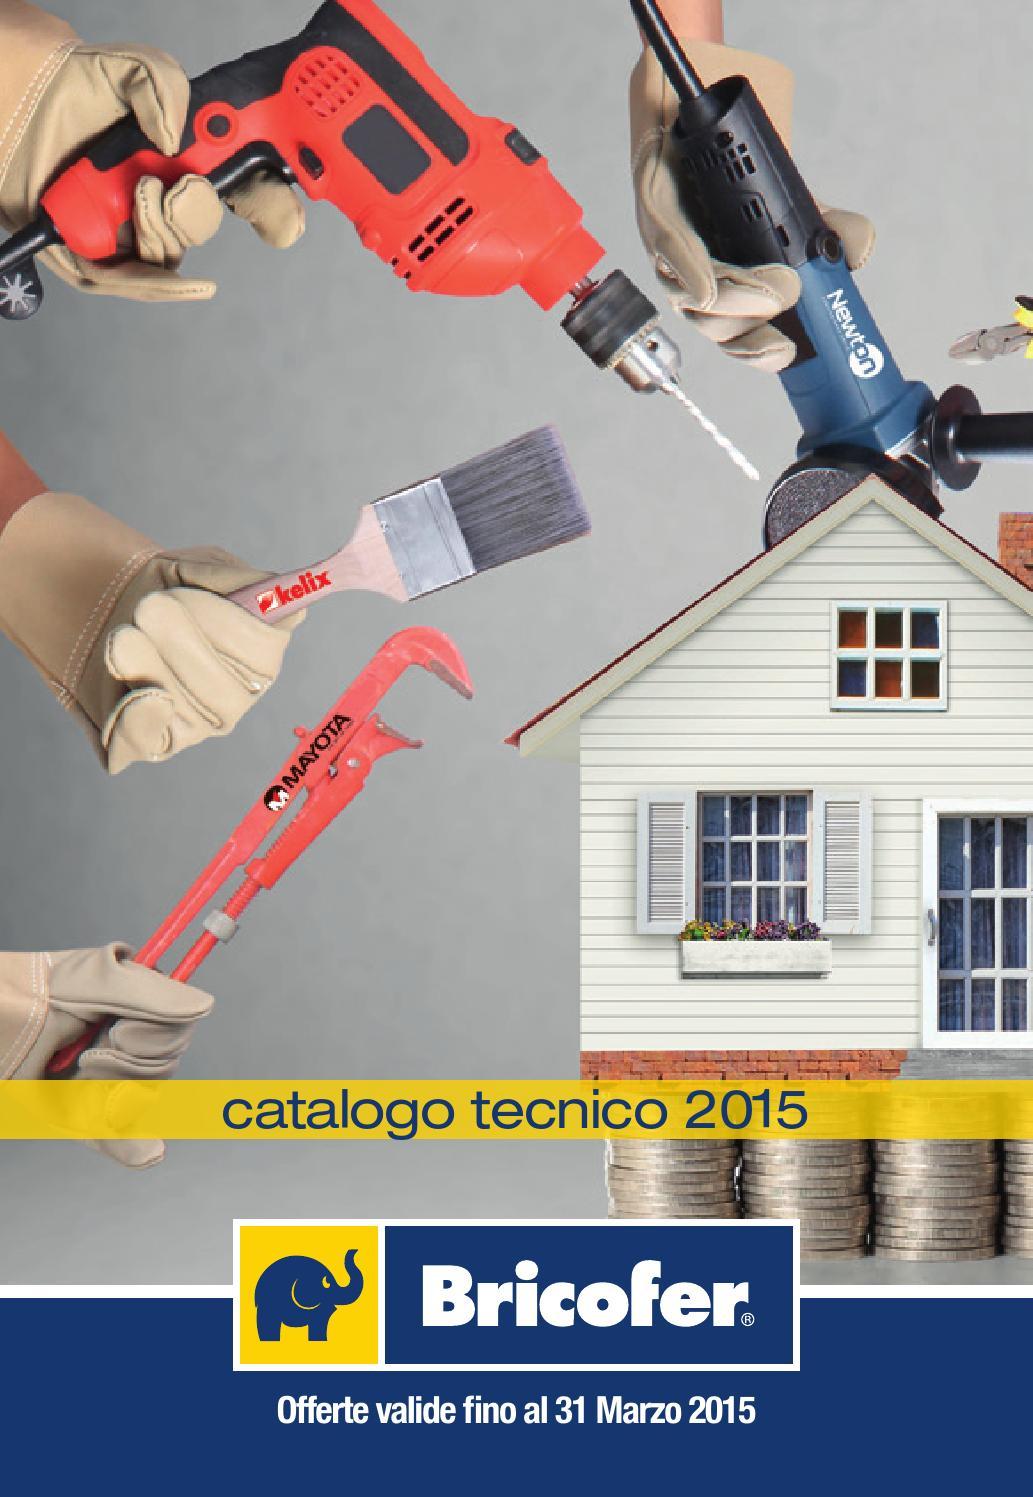 Issuu catalogo tecnico by bricofer italia spa for Bricofer catalogo